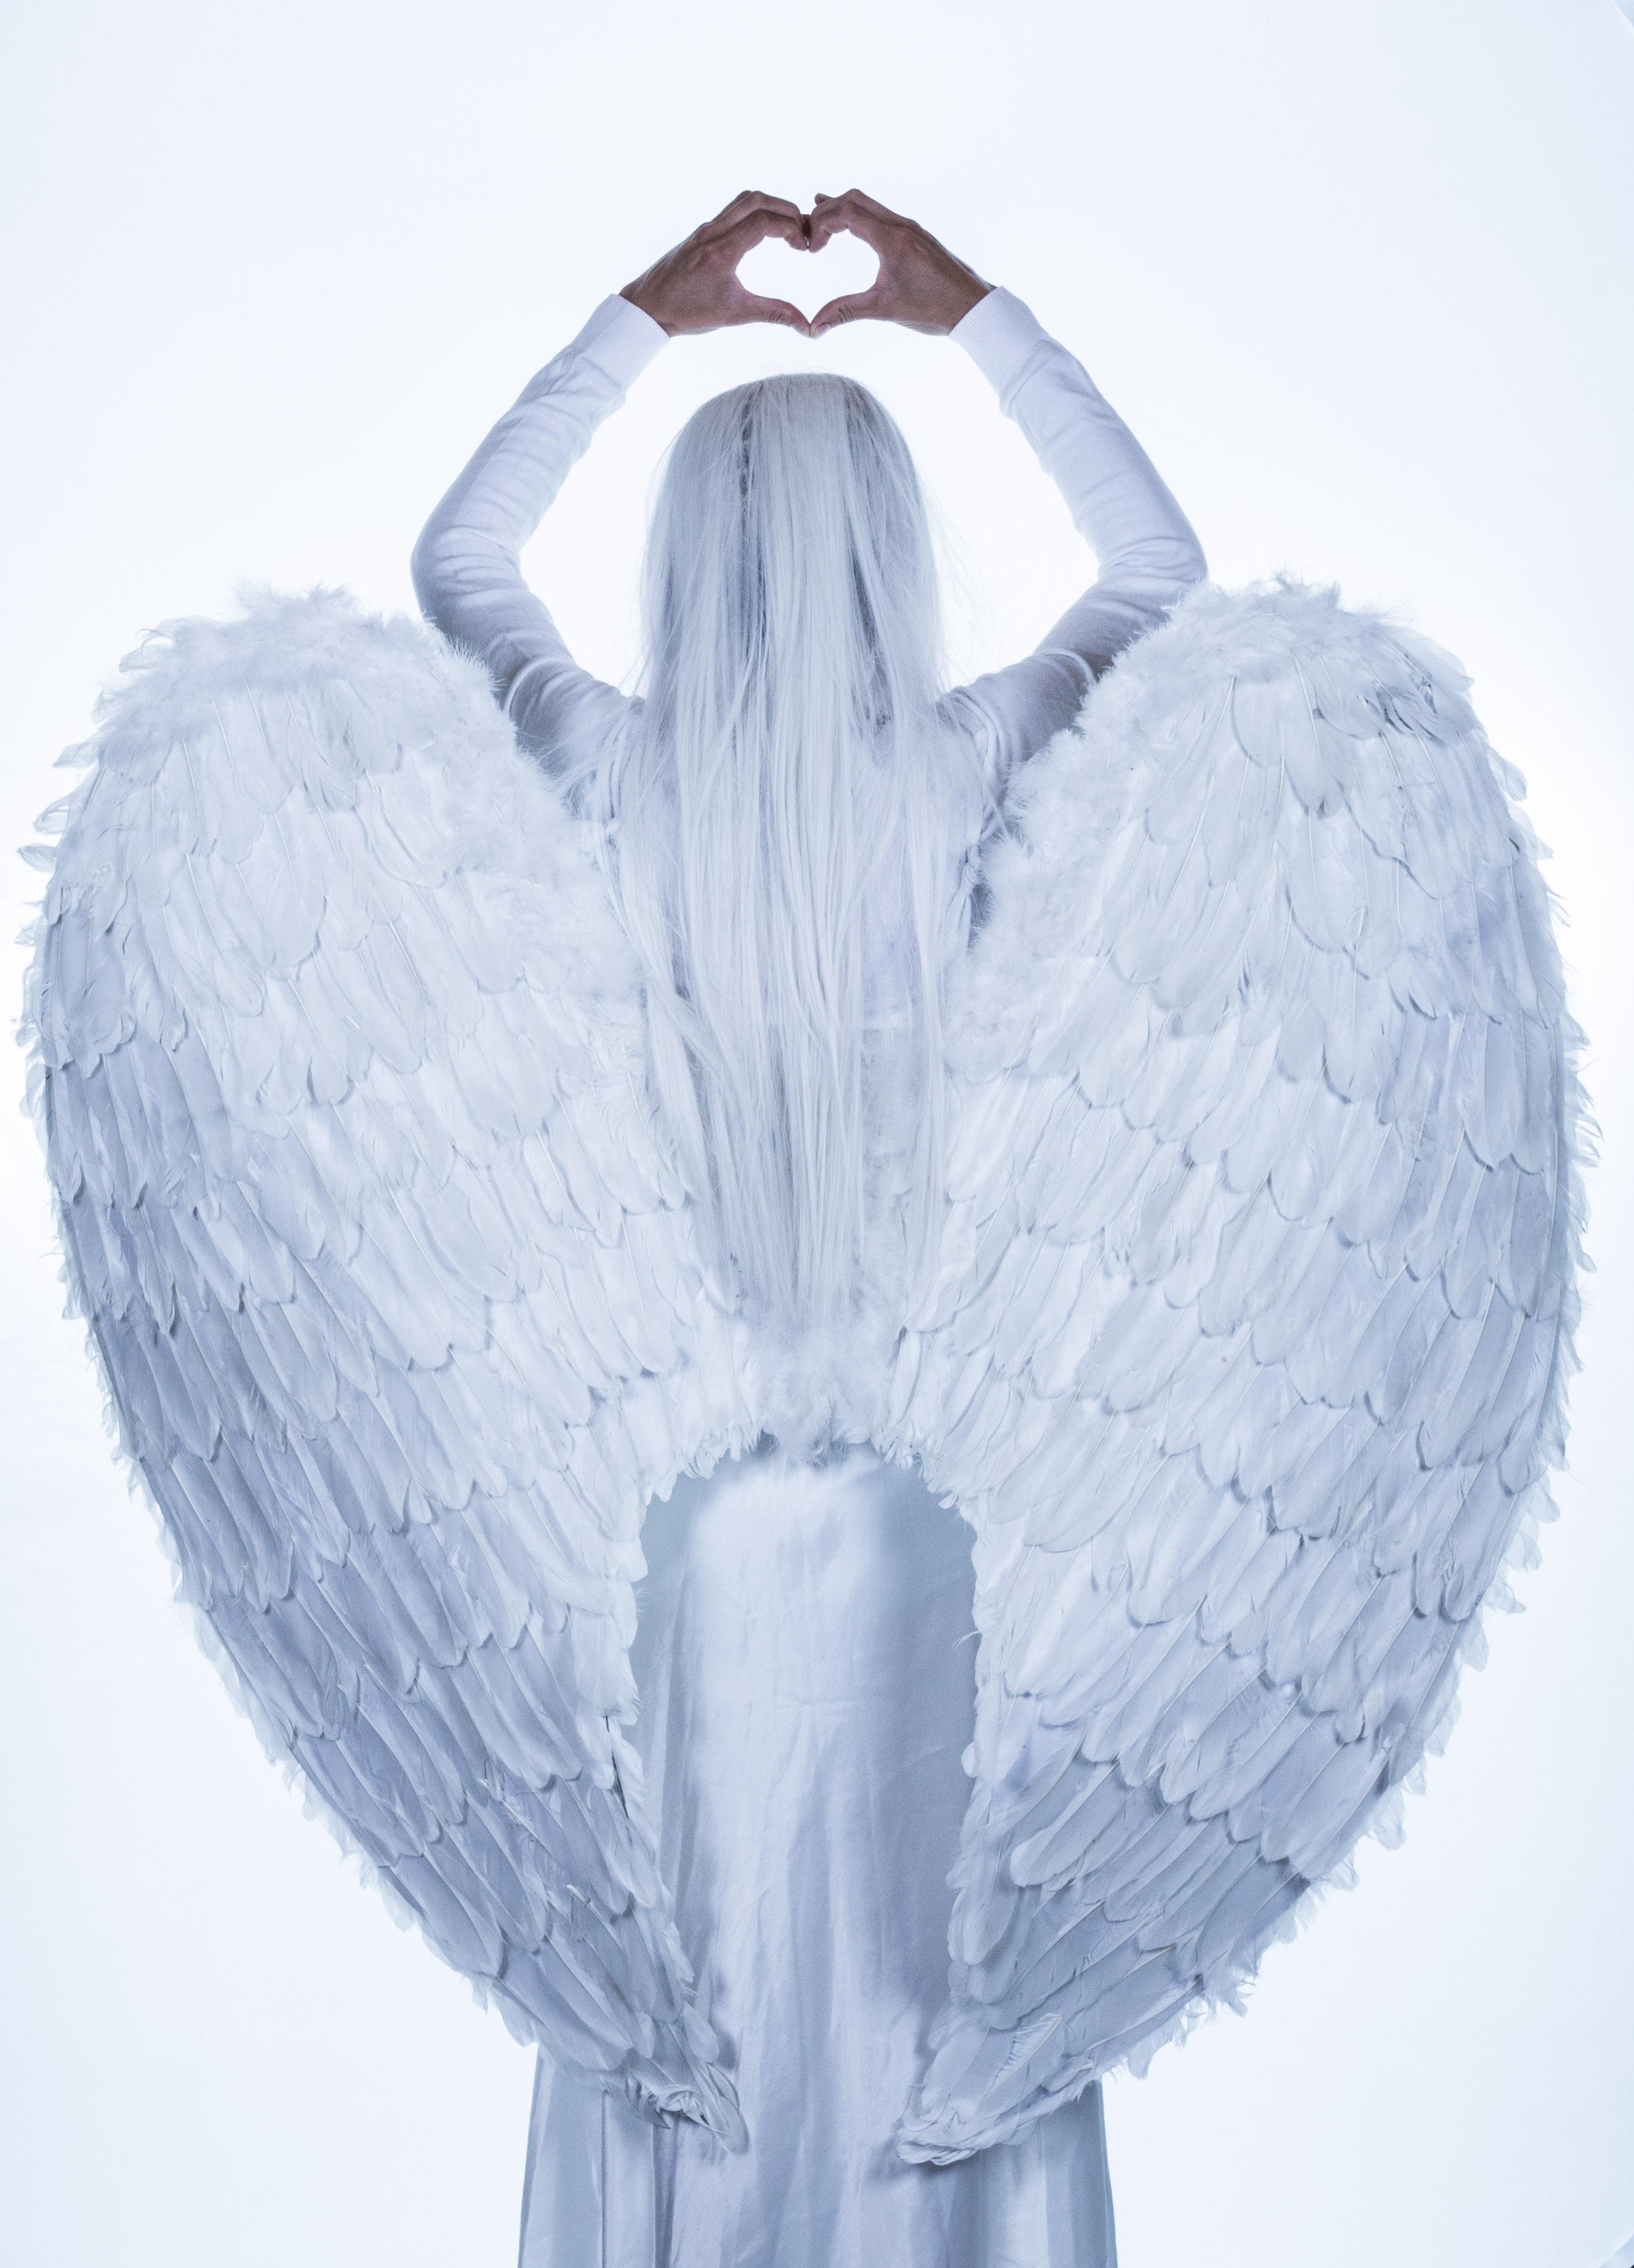 angel-819644